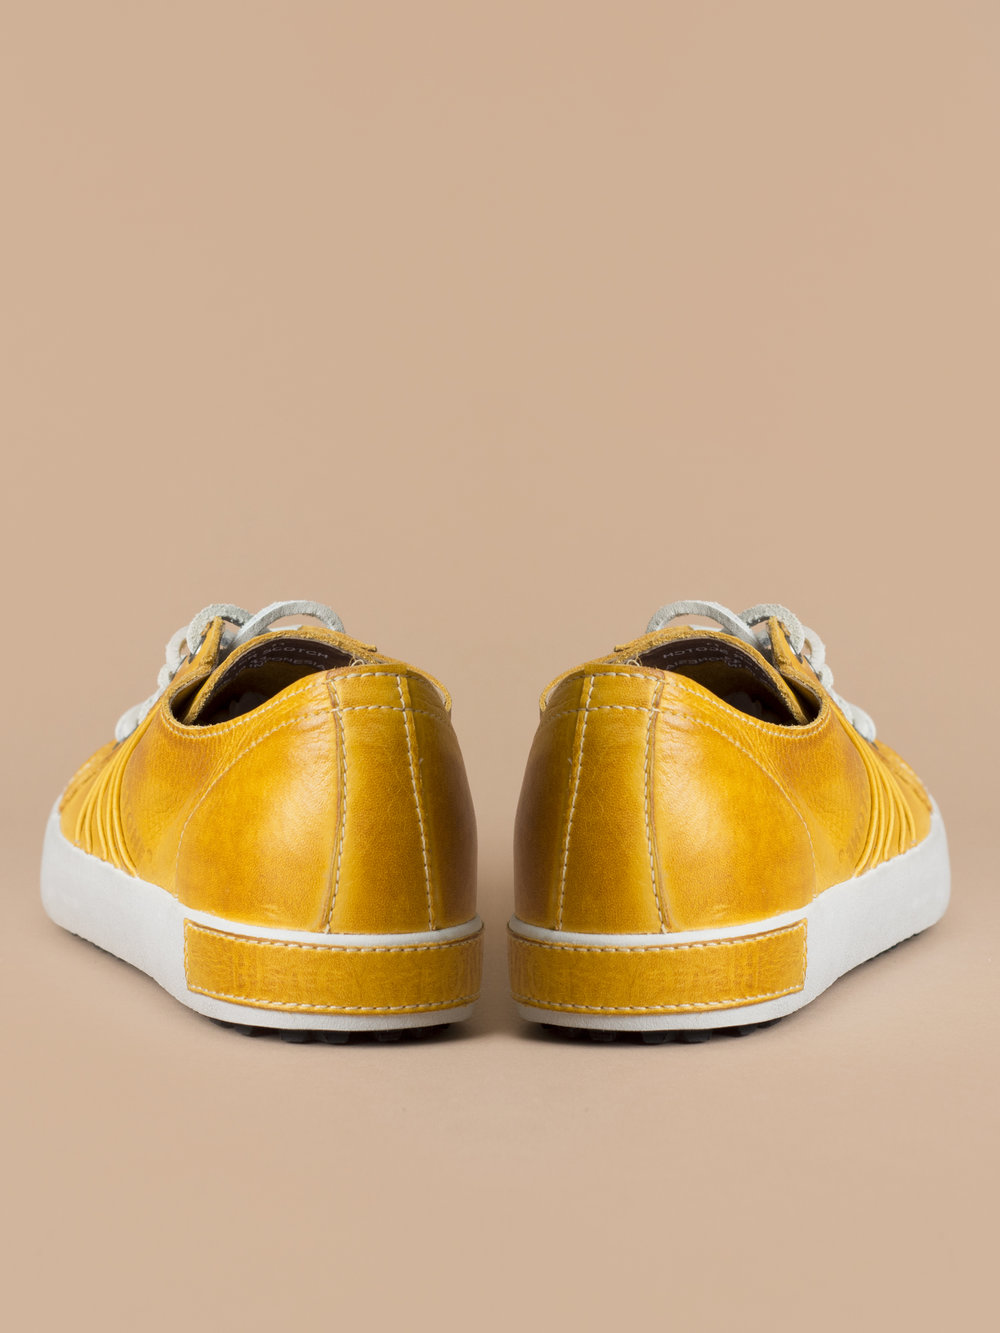 10-Yellow-Back.jpg